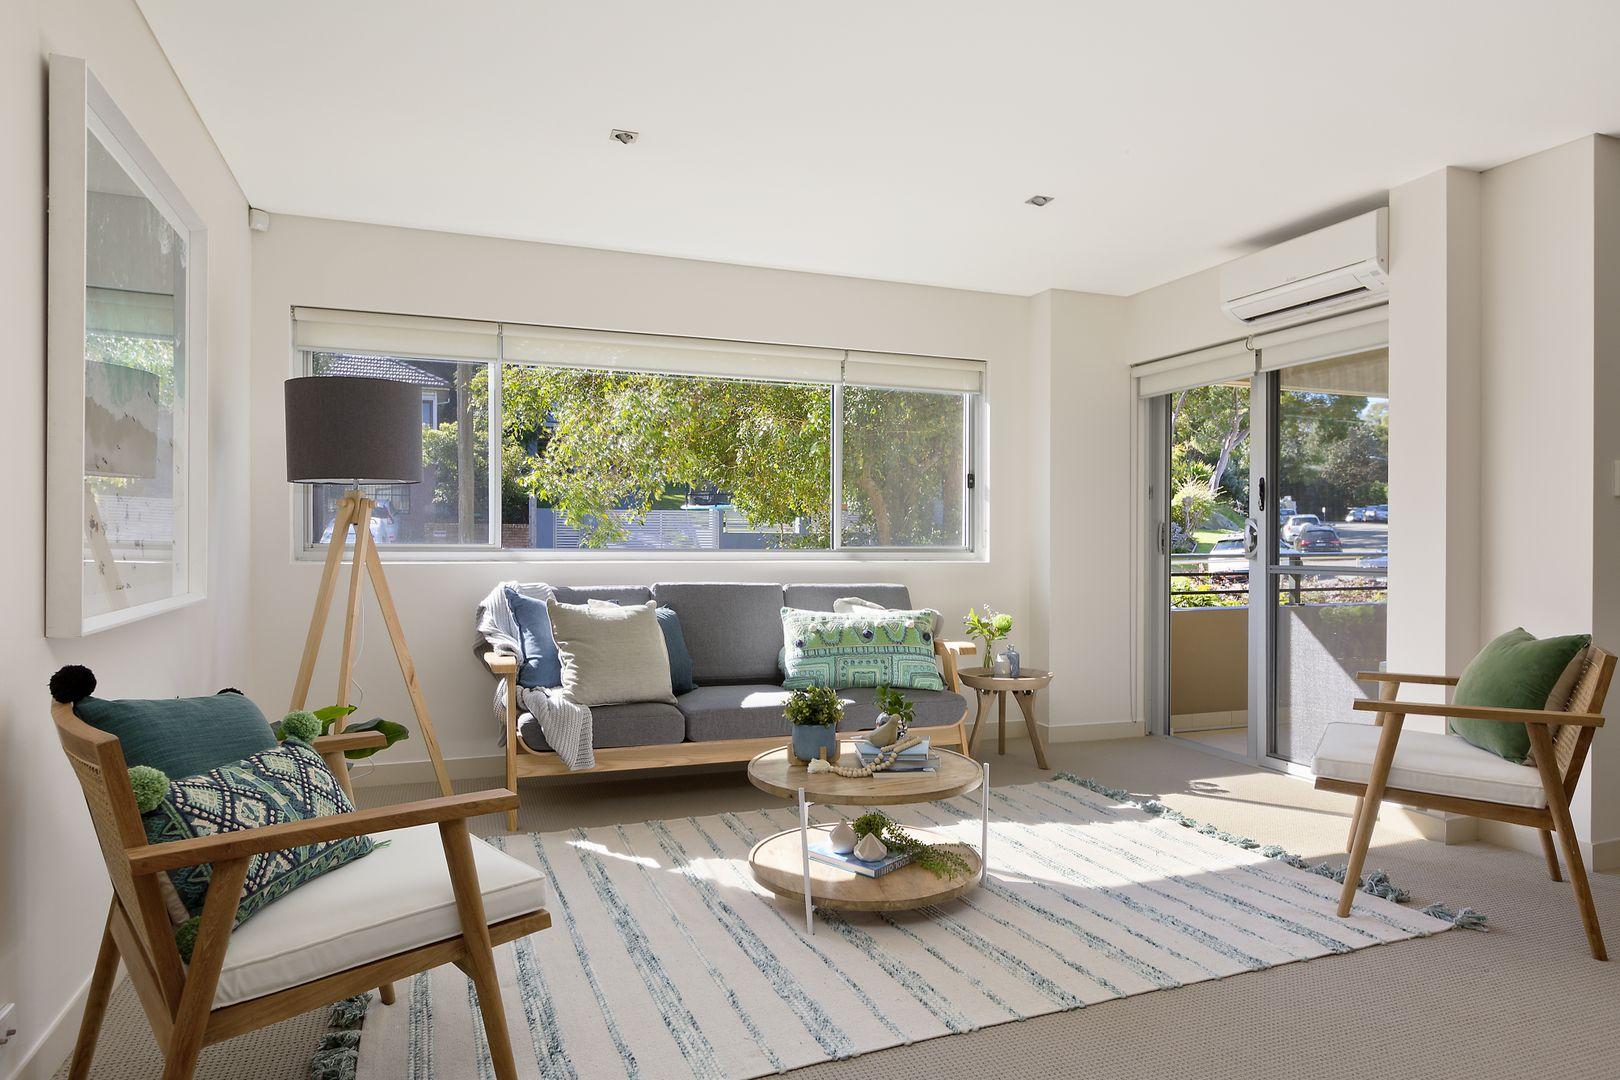 15/29-33 Waine  Street, Freshwater NSW 2096, Image 0